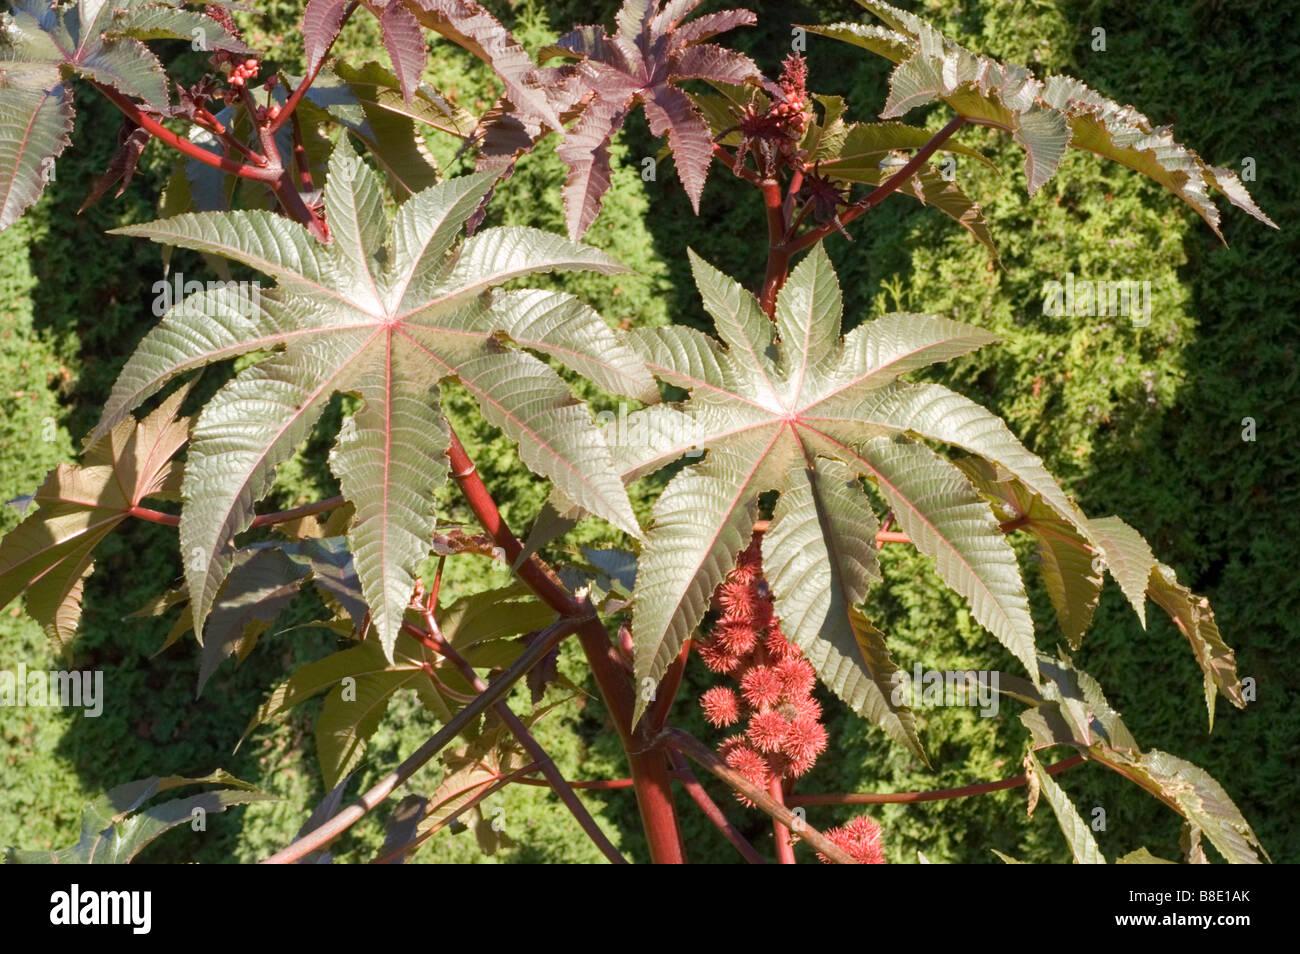 bl tter und rote fr chte der pflanze rizinuspflanze oder rizinus l euphorbiaceae ricinus. Black Bedroom Furniture Sets. Home Design Ideas